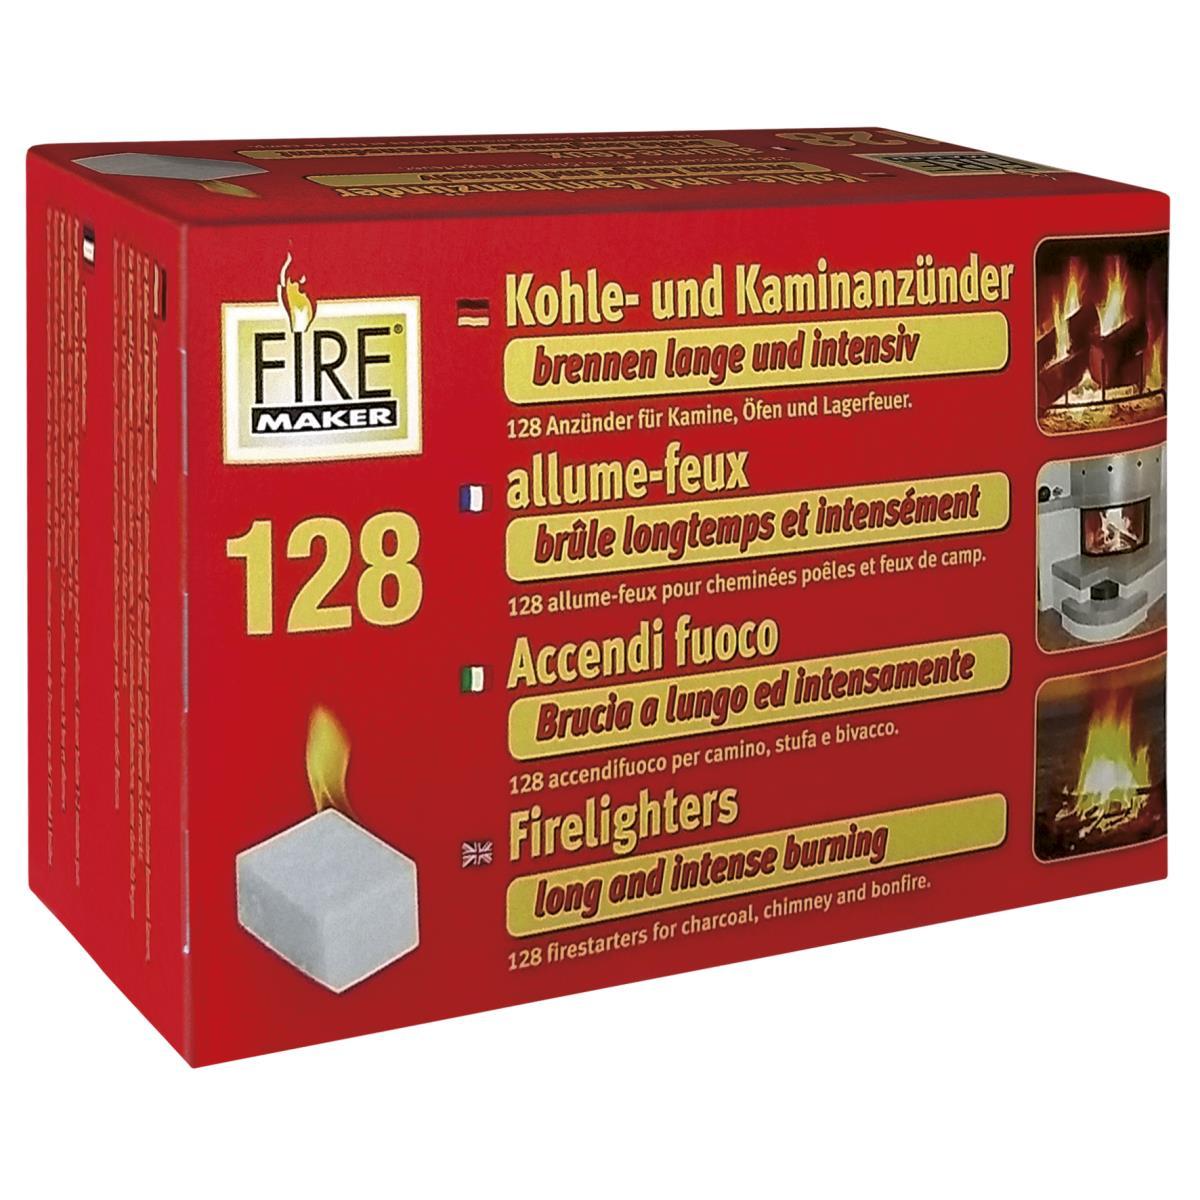 Anzündwürfel Kaminanzünder Ofenanzünder Kohleanzünder Holzanzünder Kaminholz ,K M,0000216, 4004753902167